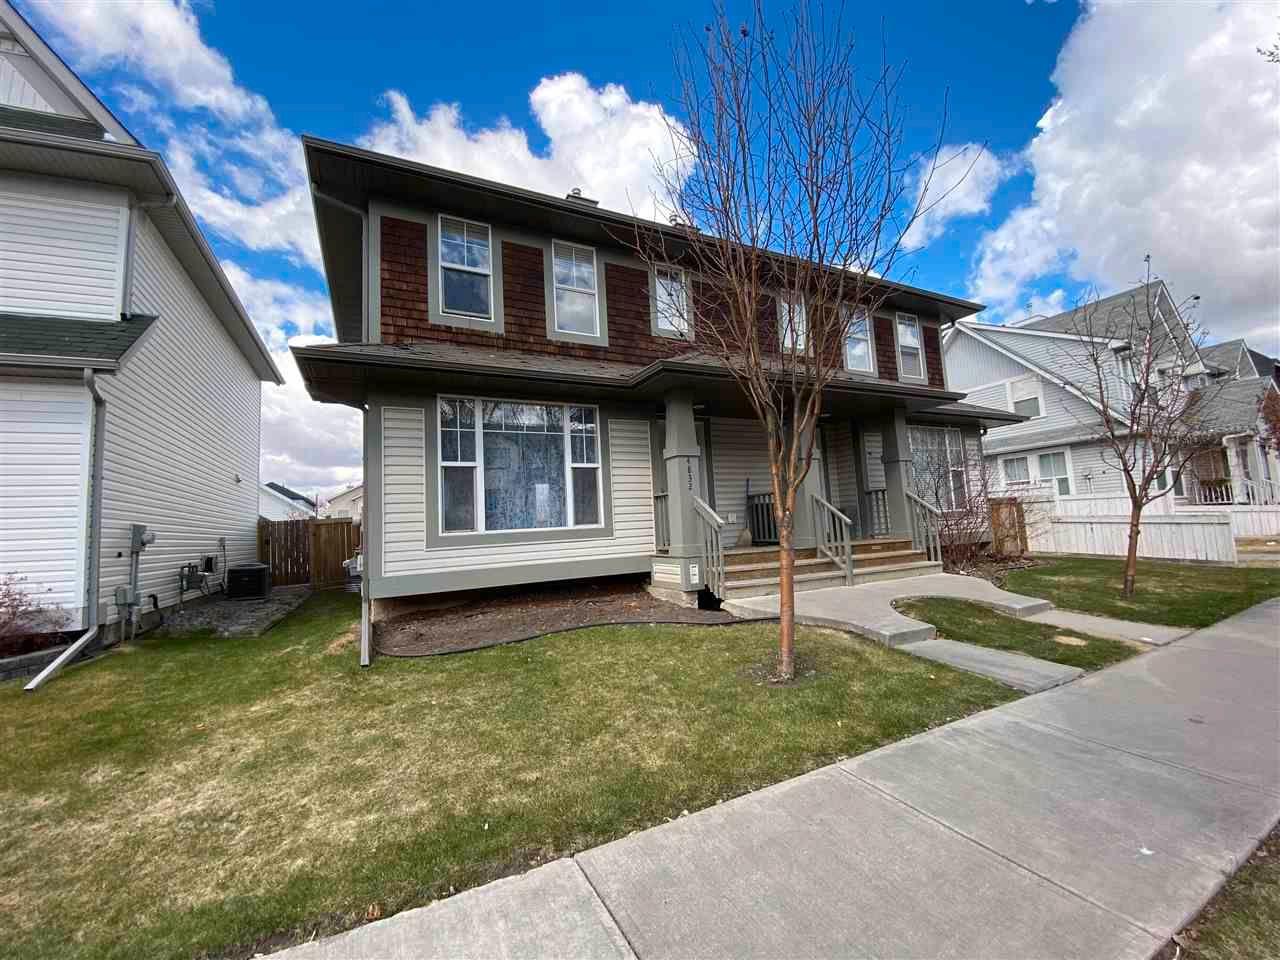 Main Photo: 4832 TERWILLEGAR Common in Edmonton: Zone 14 House Half Duplex for sale : MLS®# E4242855